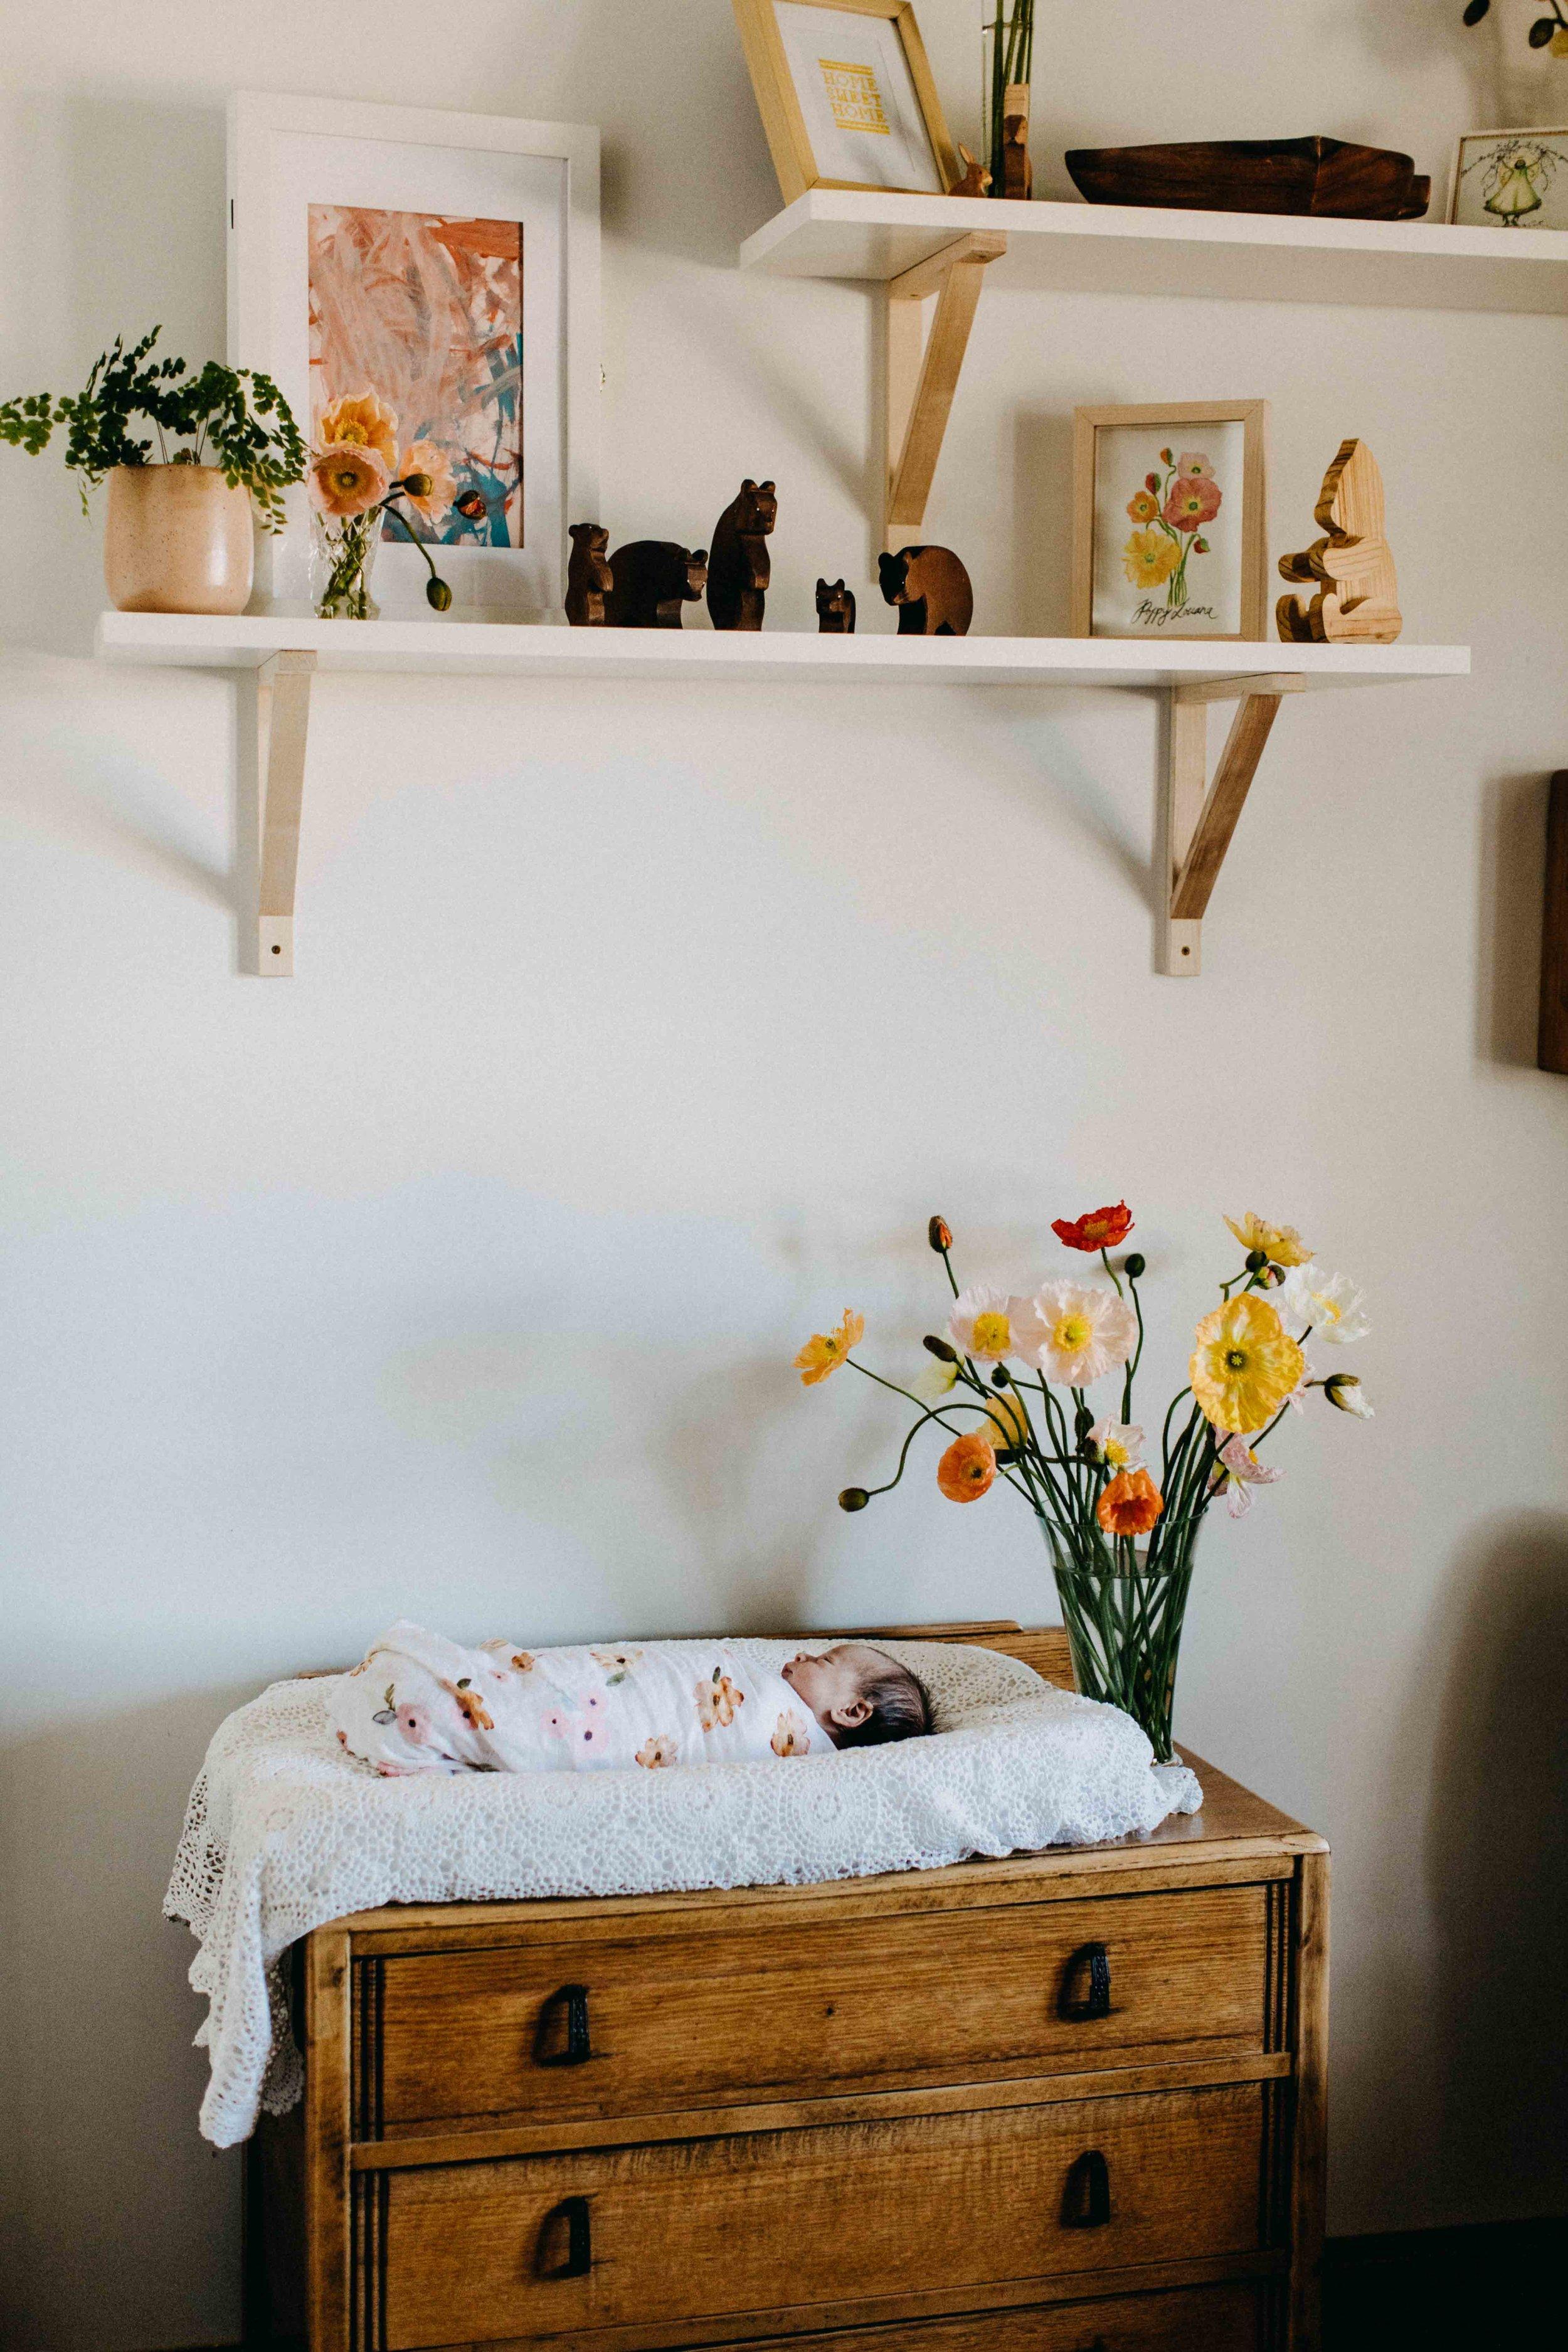 poppy-newborn-the-oaks-family-photographer-www.emilyobrienphotography.net-40.jpg